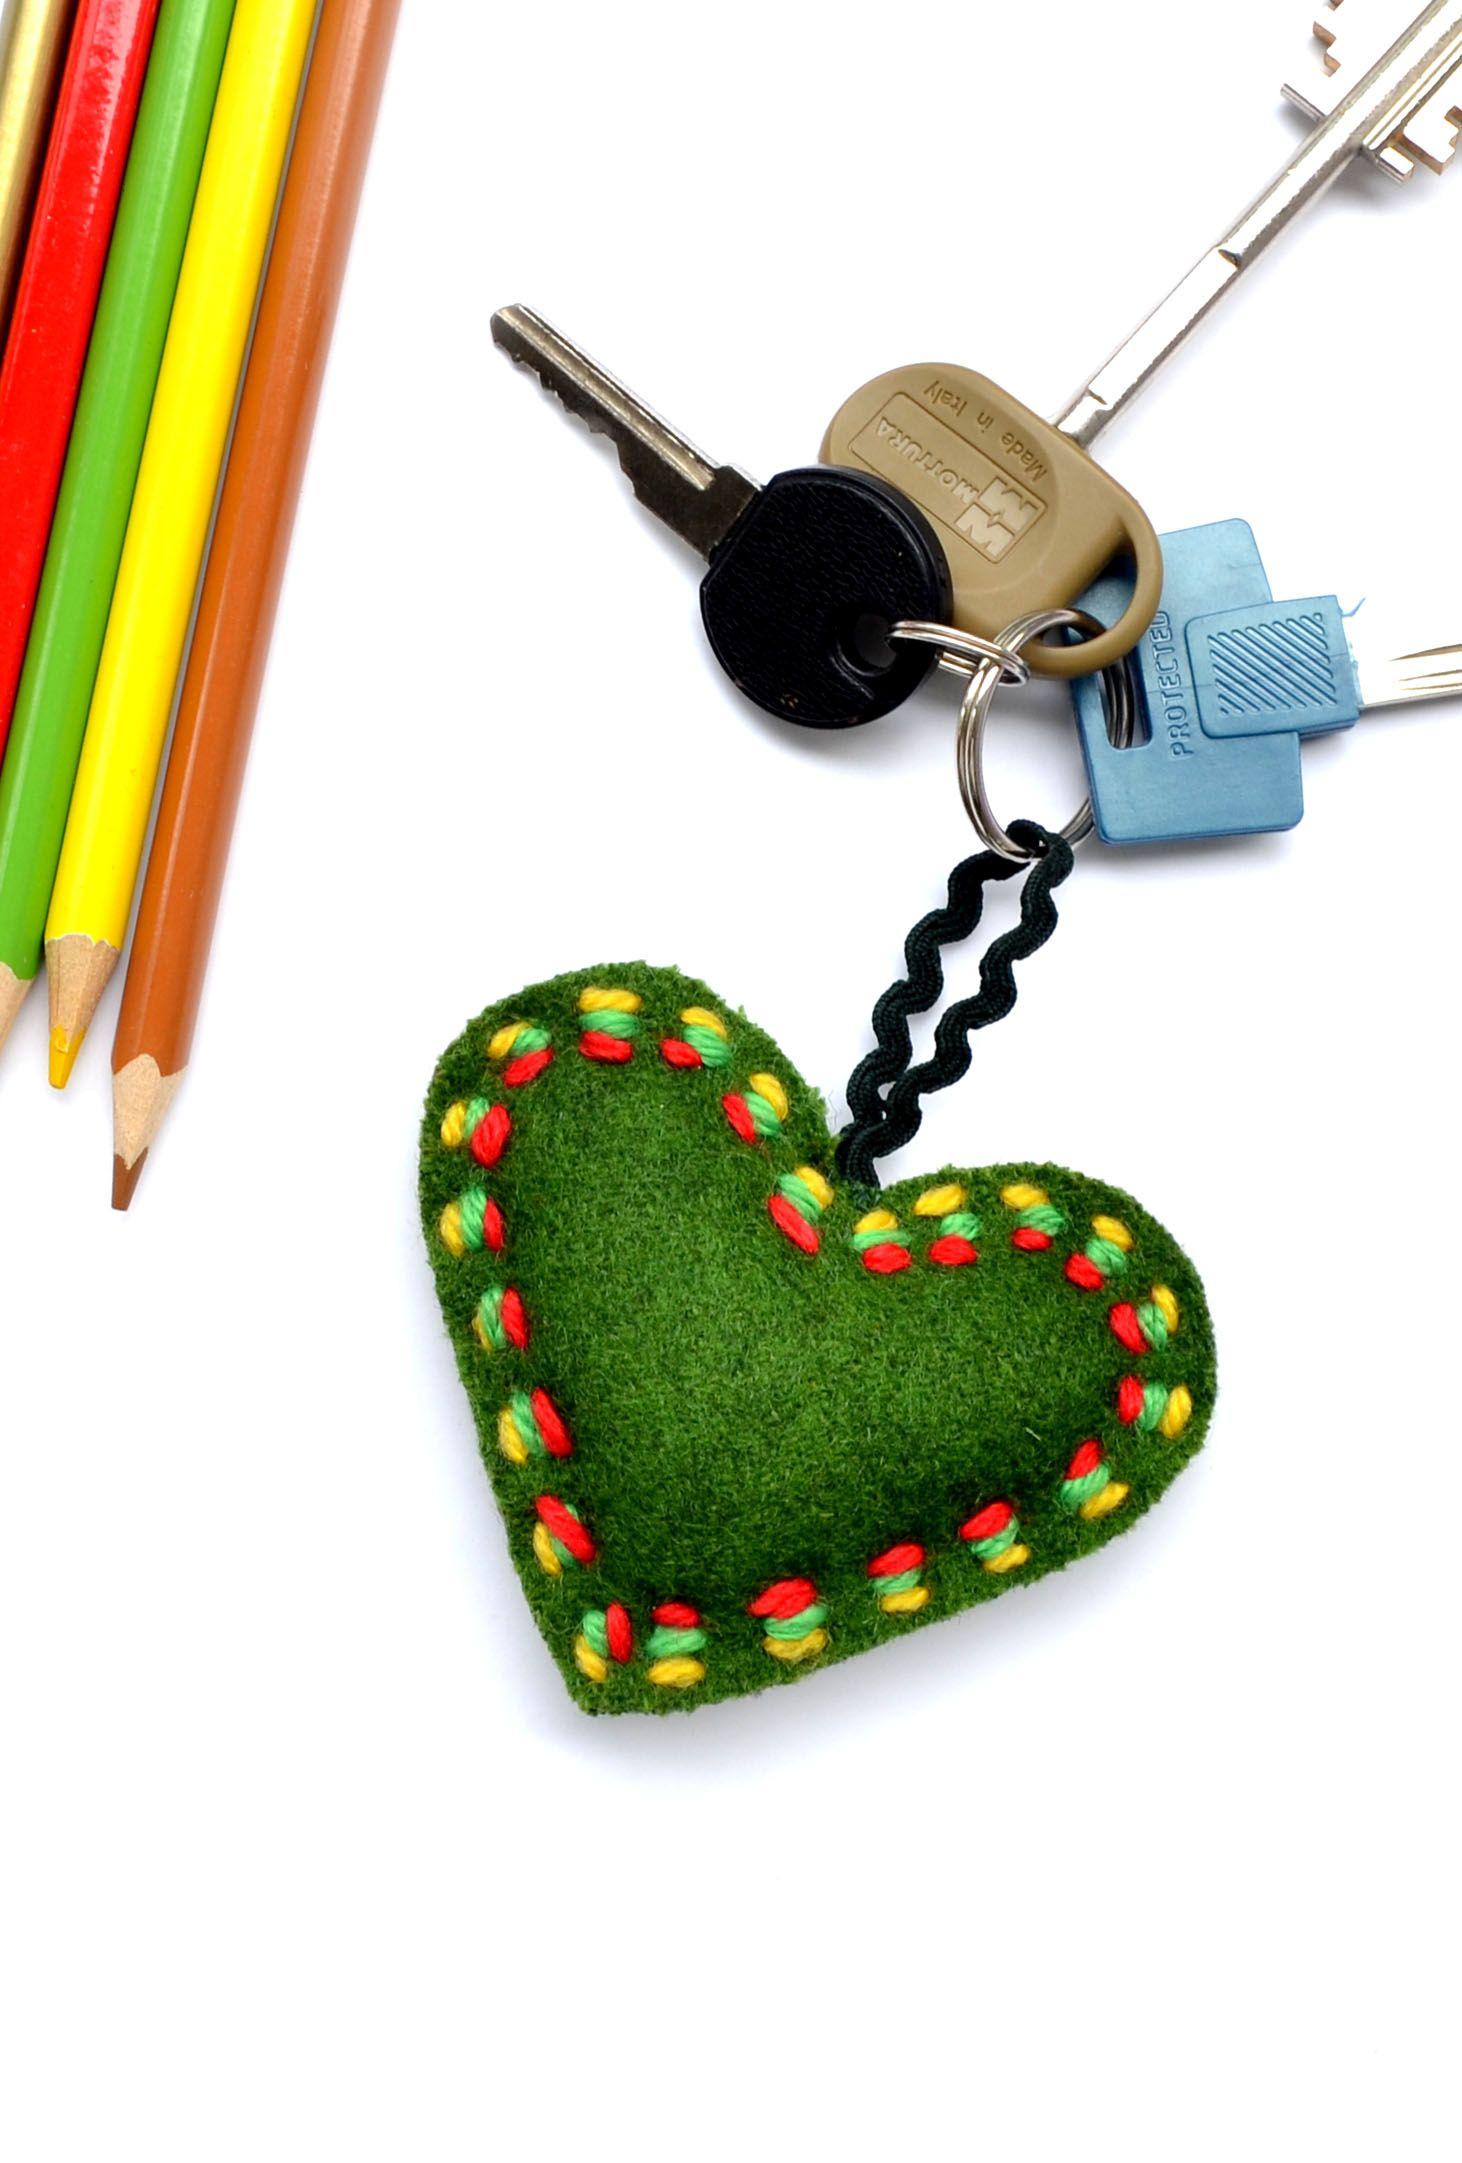 Green Soft Wool Bag Charm Heart Cushion Keychain Toy Gift Home